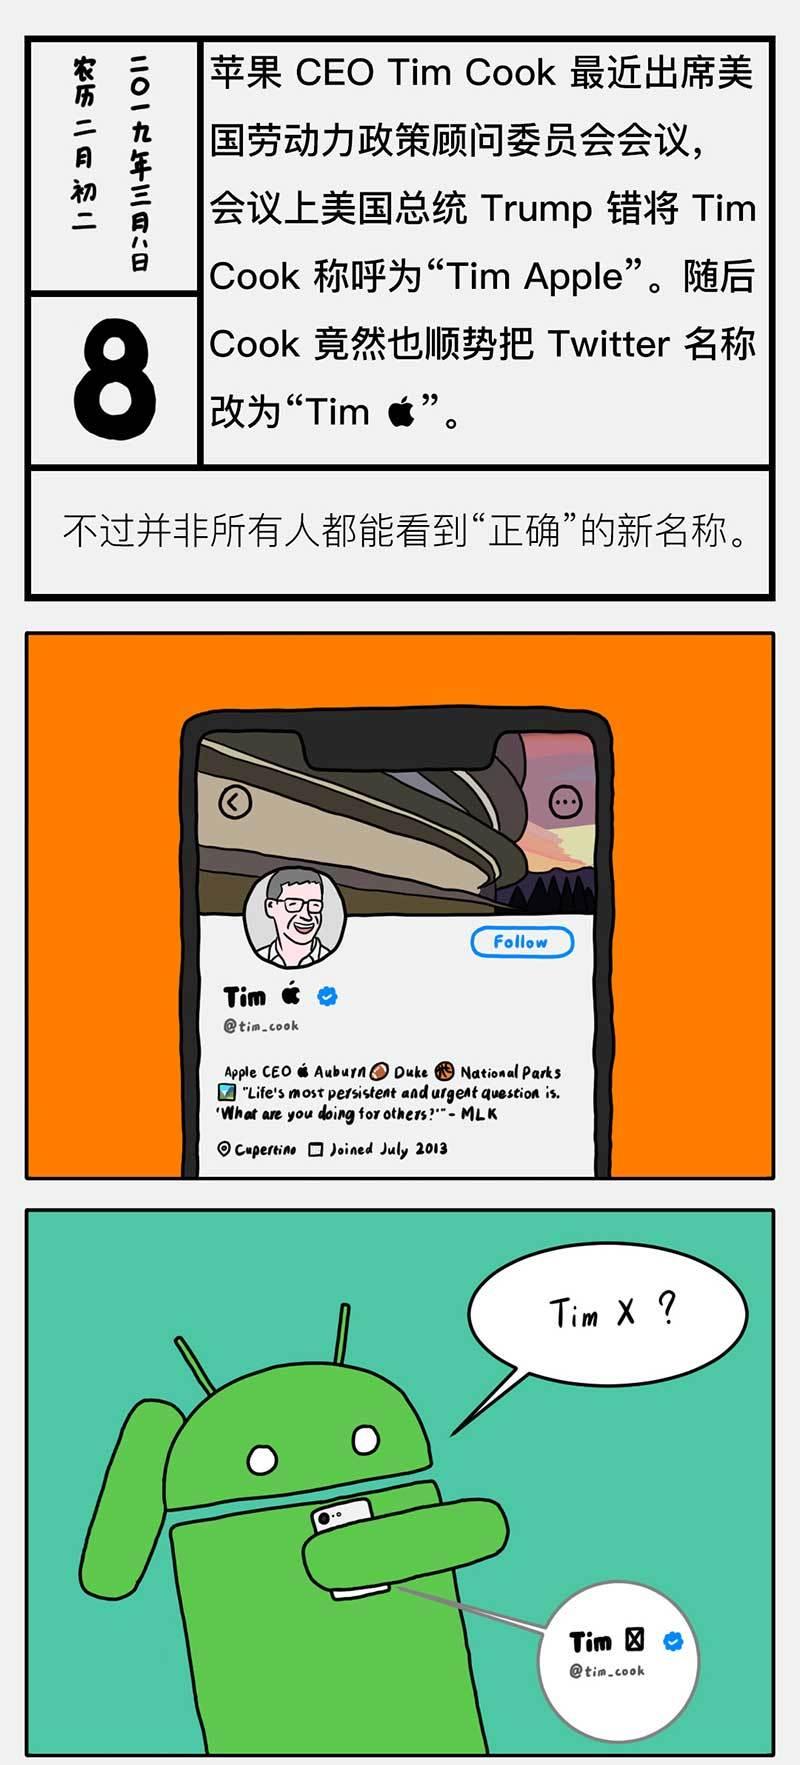 克 twitter 中 元 三